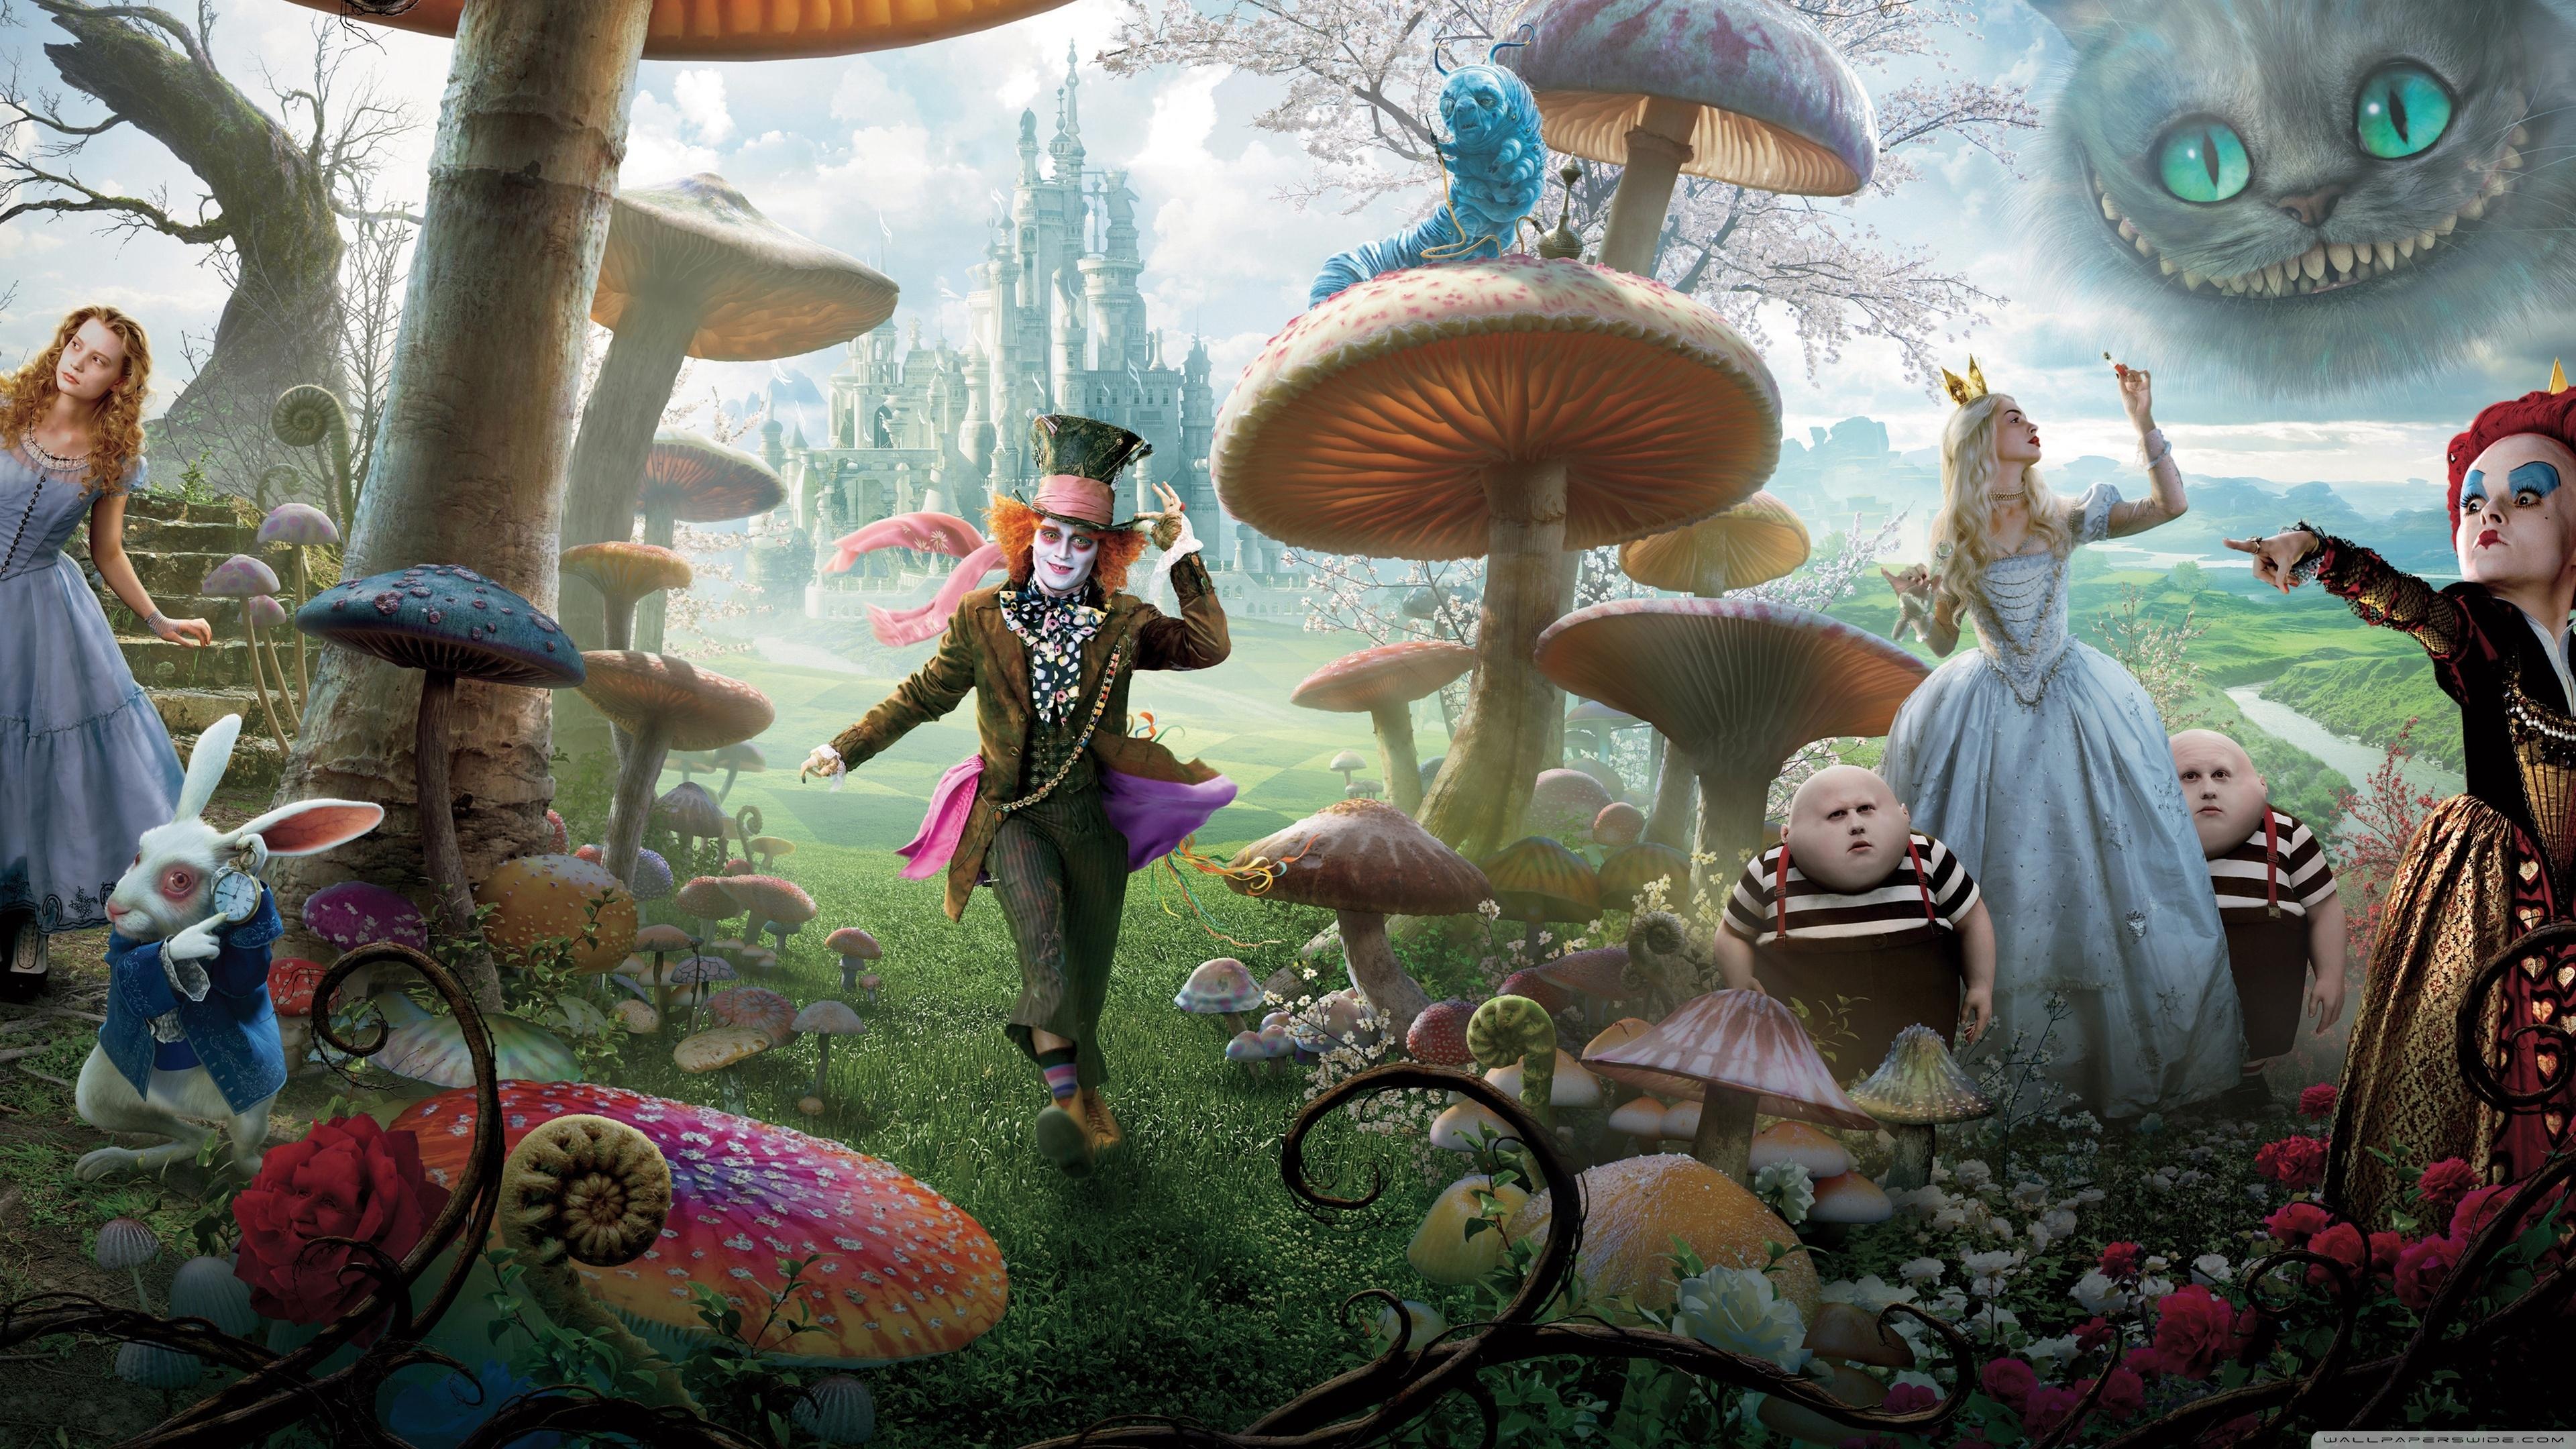 alice in wonderland movie 2010 ❤ 4k hd desktop wallpaper for 4k